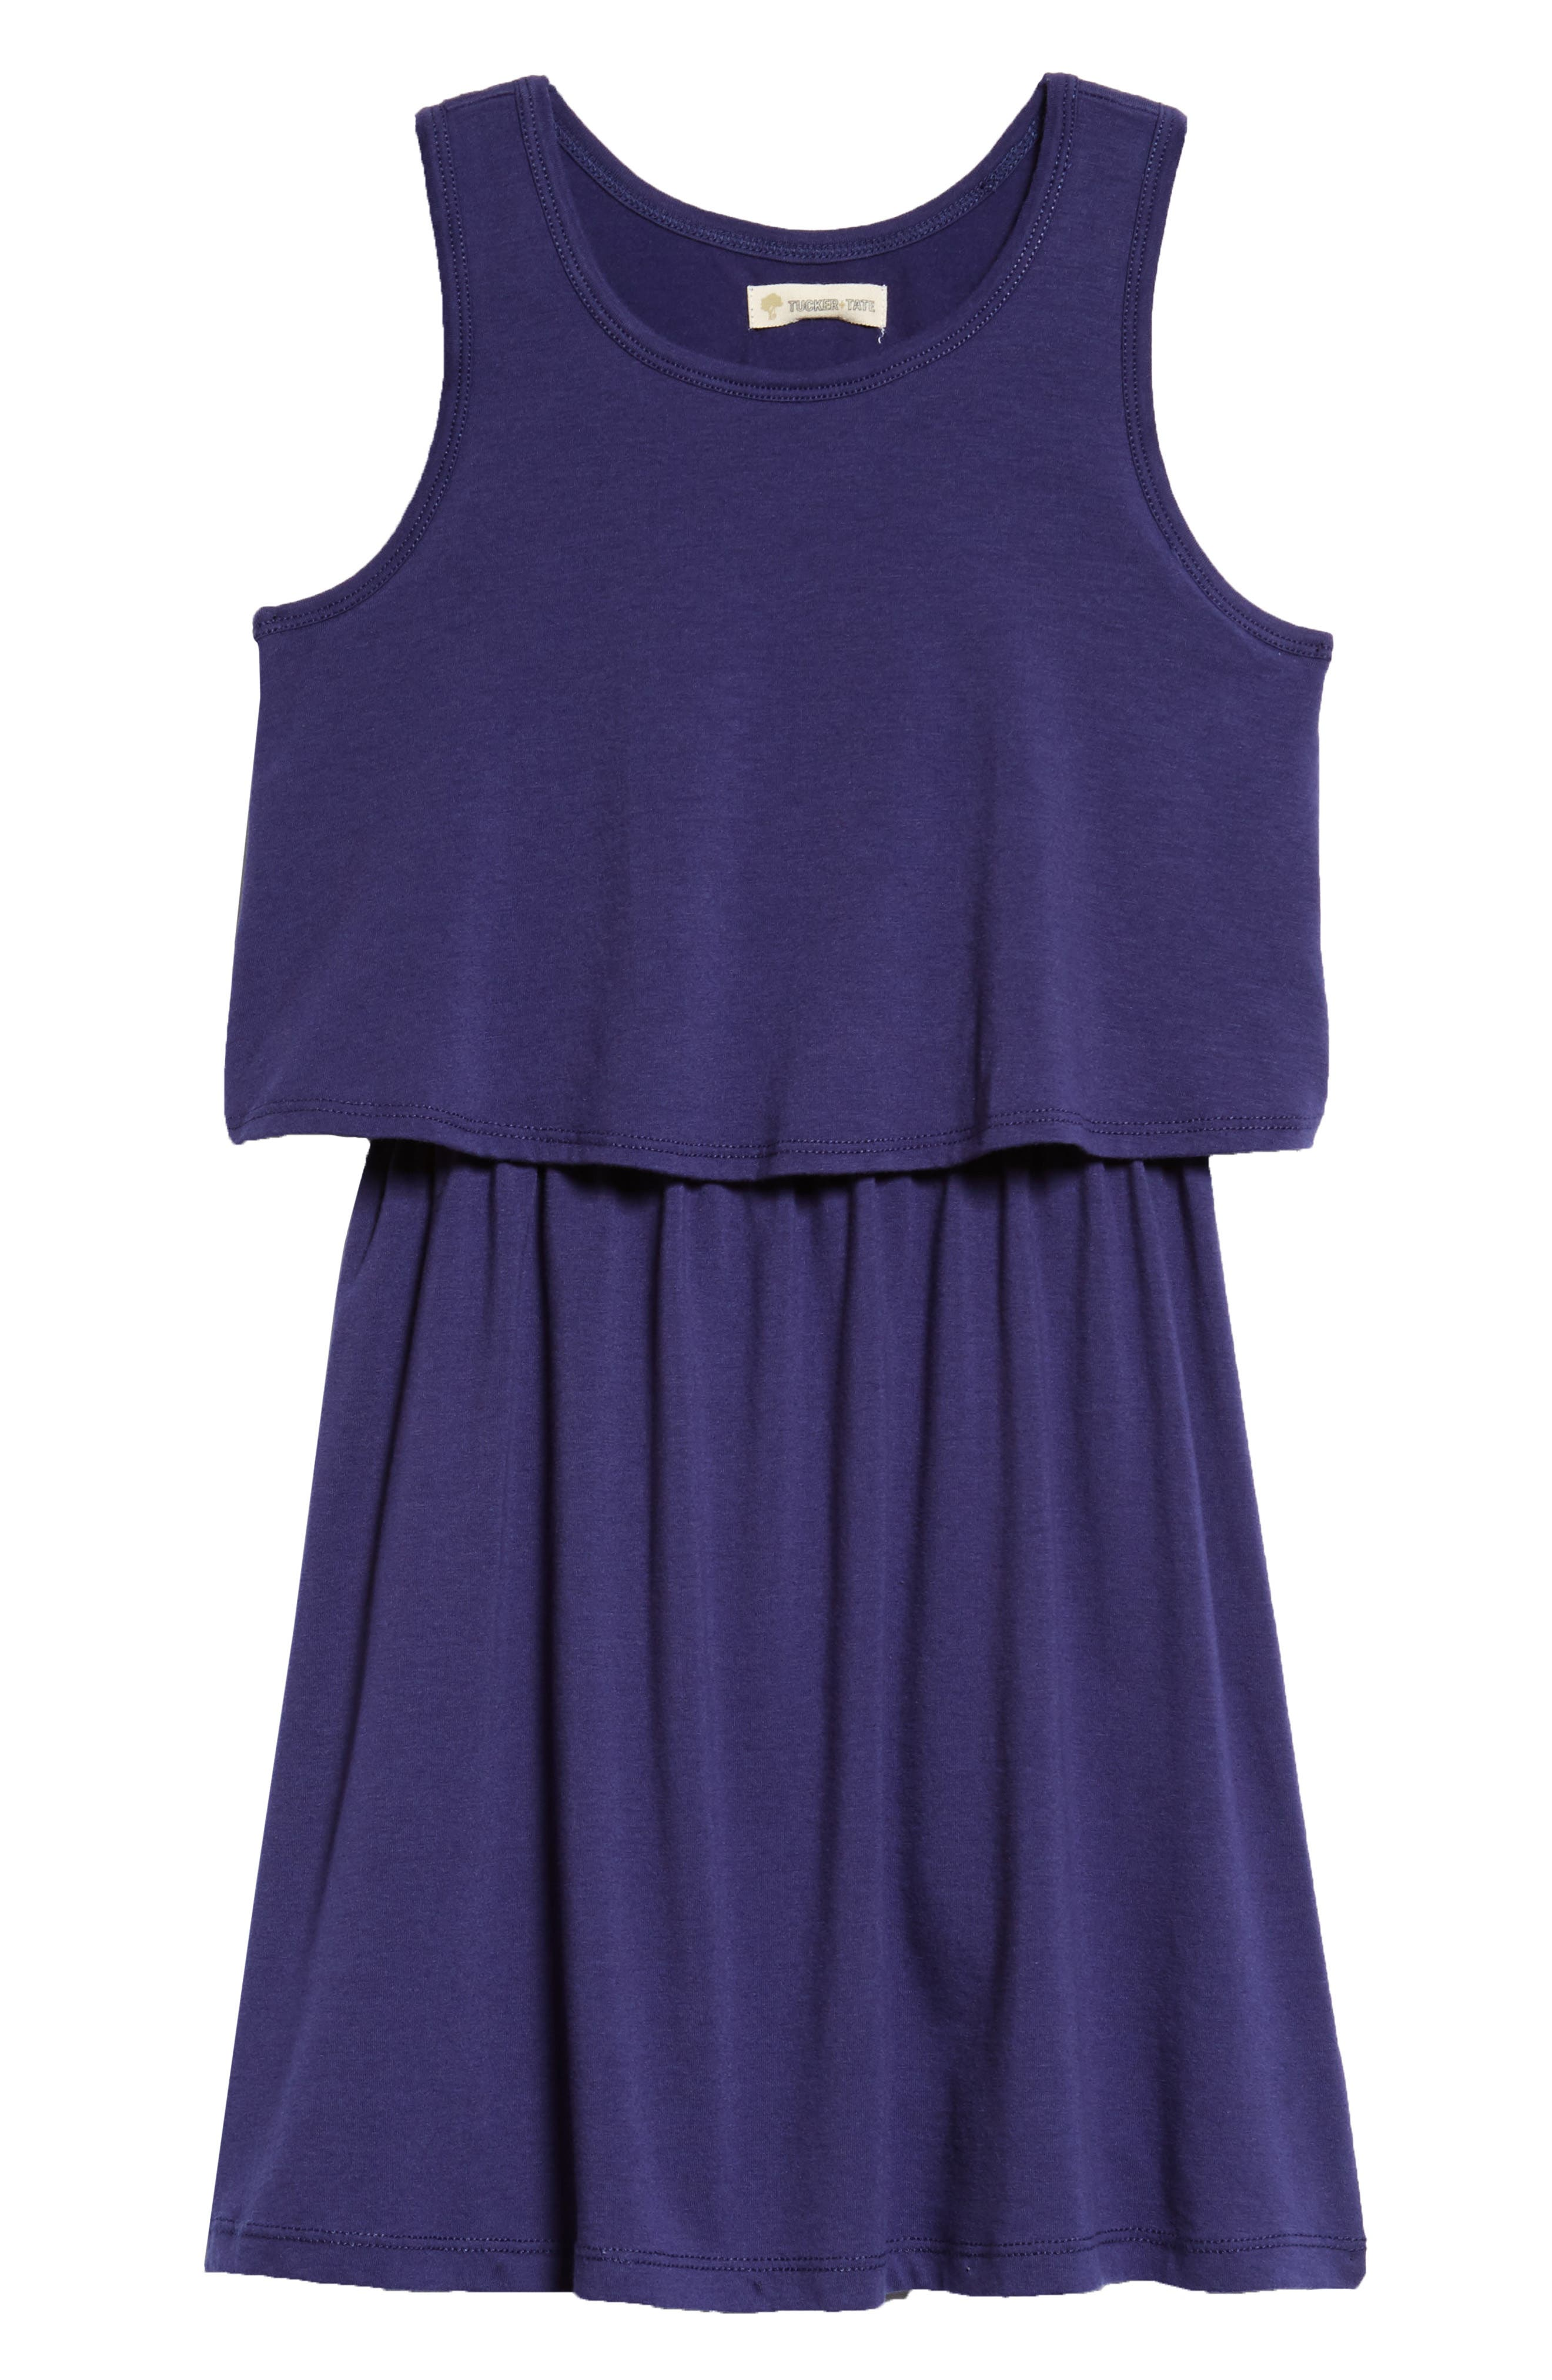 Popover Knit Tank Dress,                             Main thumbnail 1, color,                             410